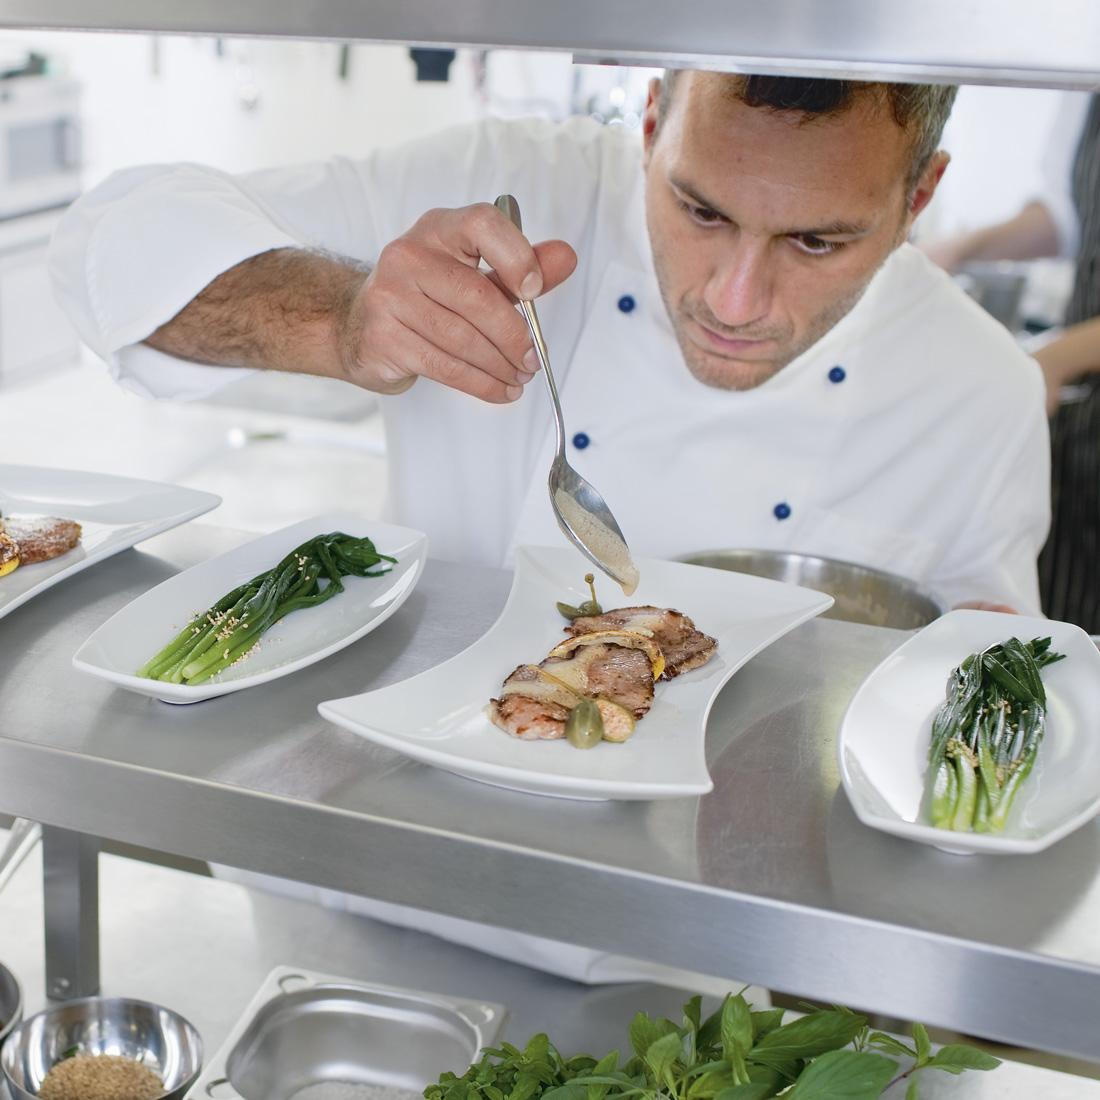 Gastronomie Küche  Jtleigh.com - Hausgestaltung Ideen